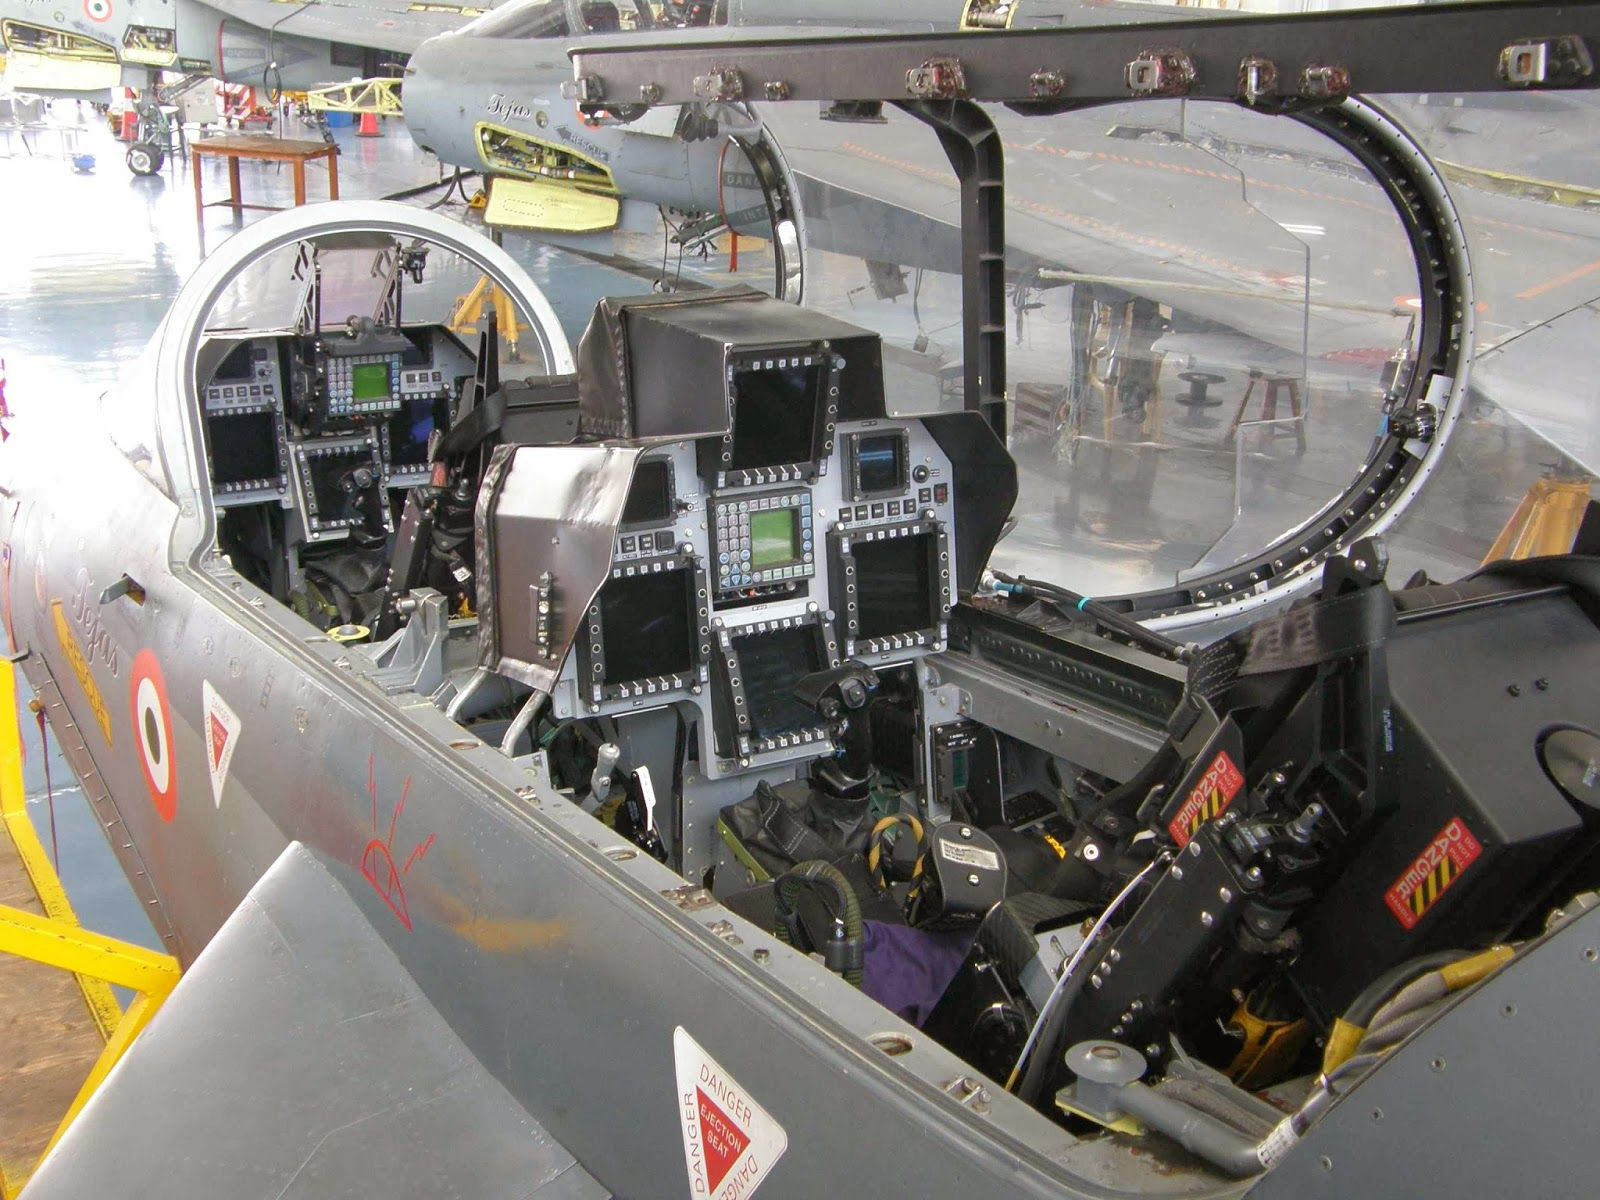 Cockpit Views Of A Trainer Variant Indian Lca Tejas Cockpit